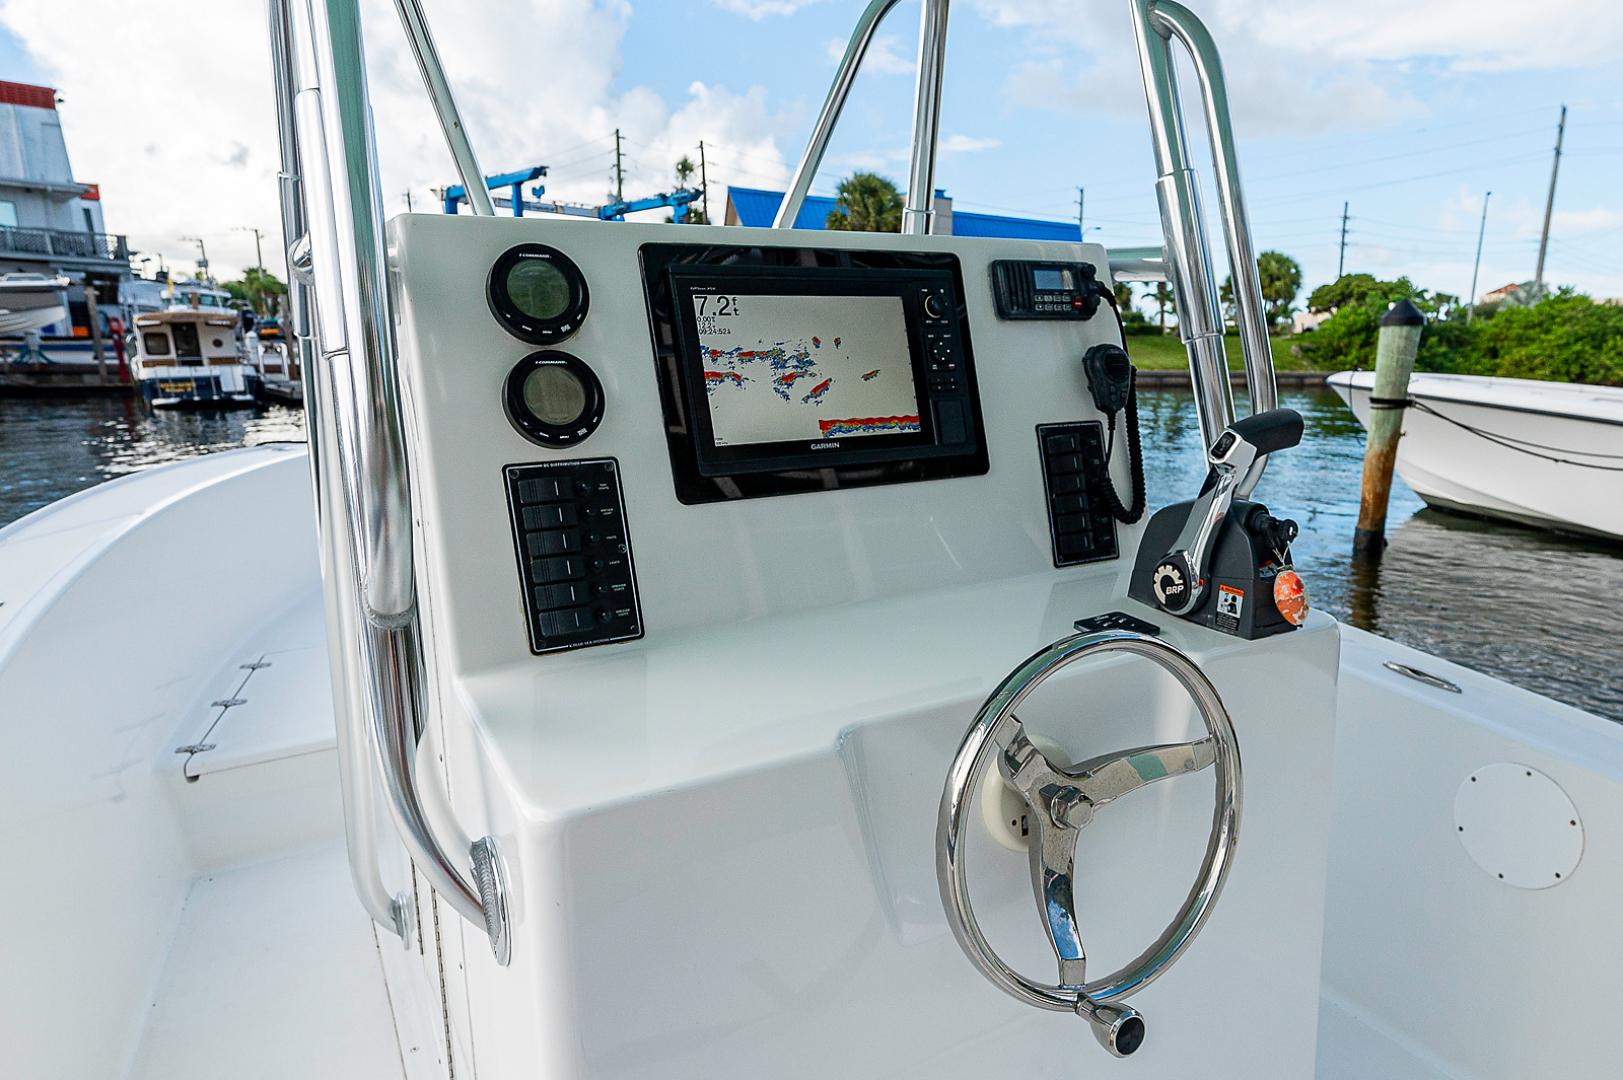 Ocean Master 2013-27 Ocean Master Palm Beach-Florida-United States-Console-1501370 | Thumbnail